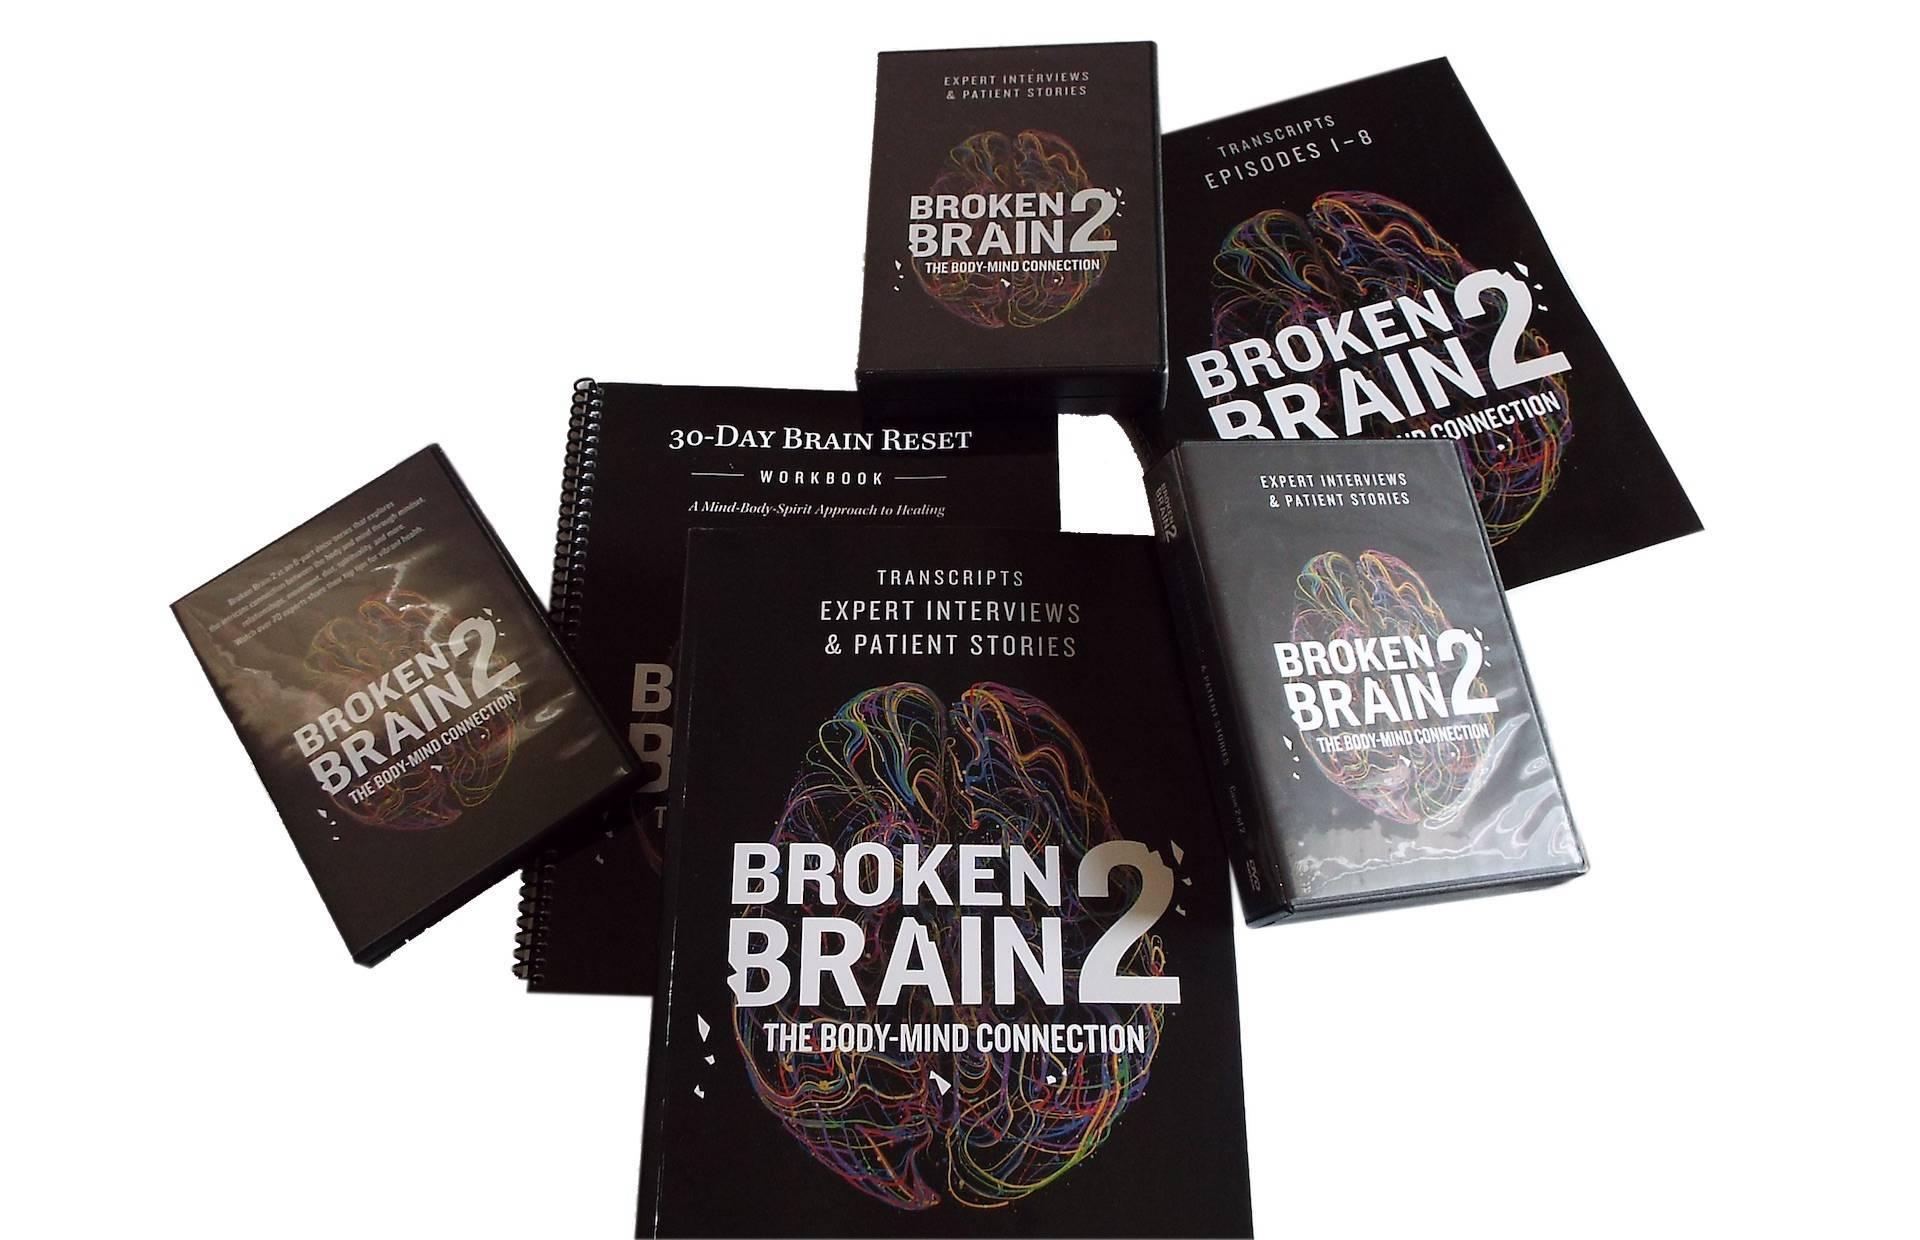 Dr. Hyman's Broken Brain 2